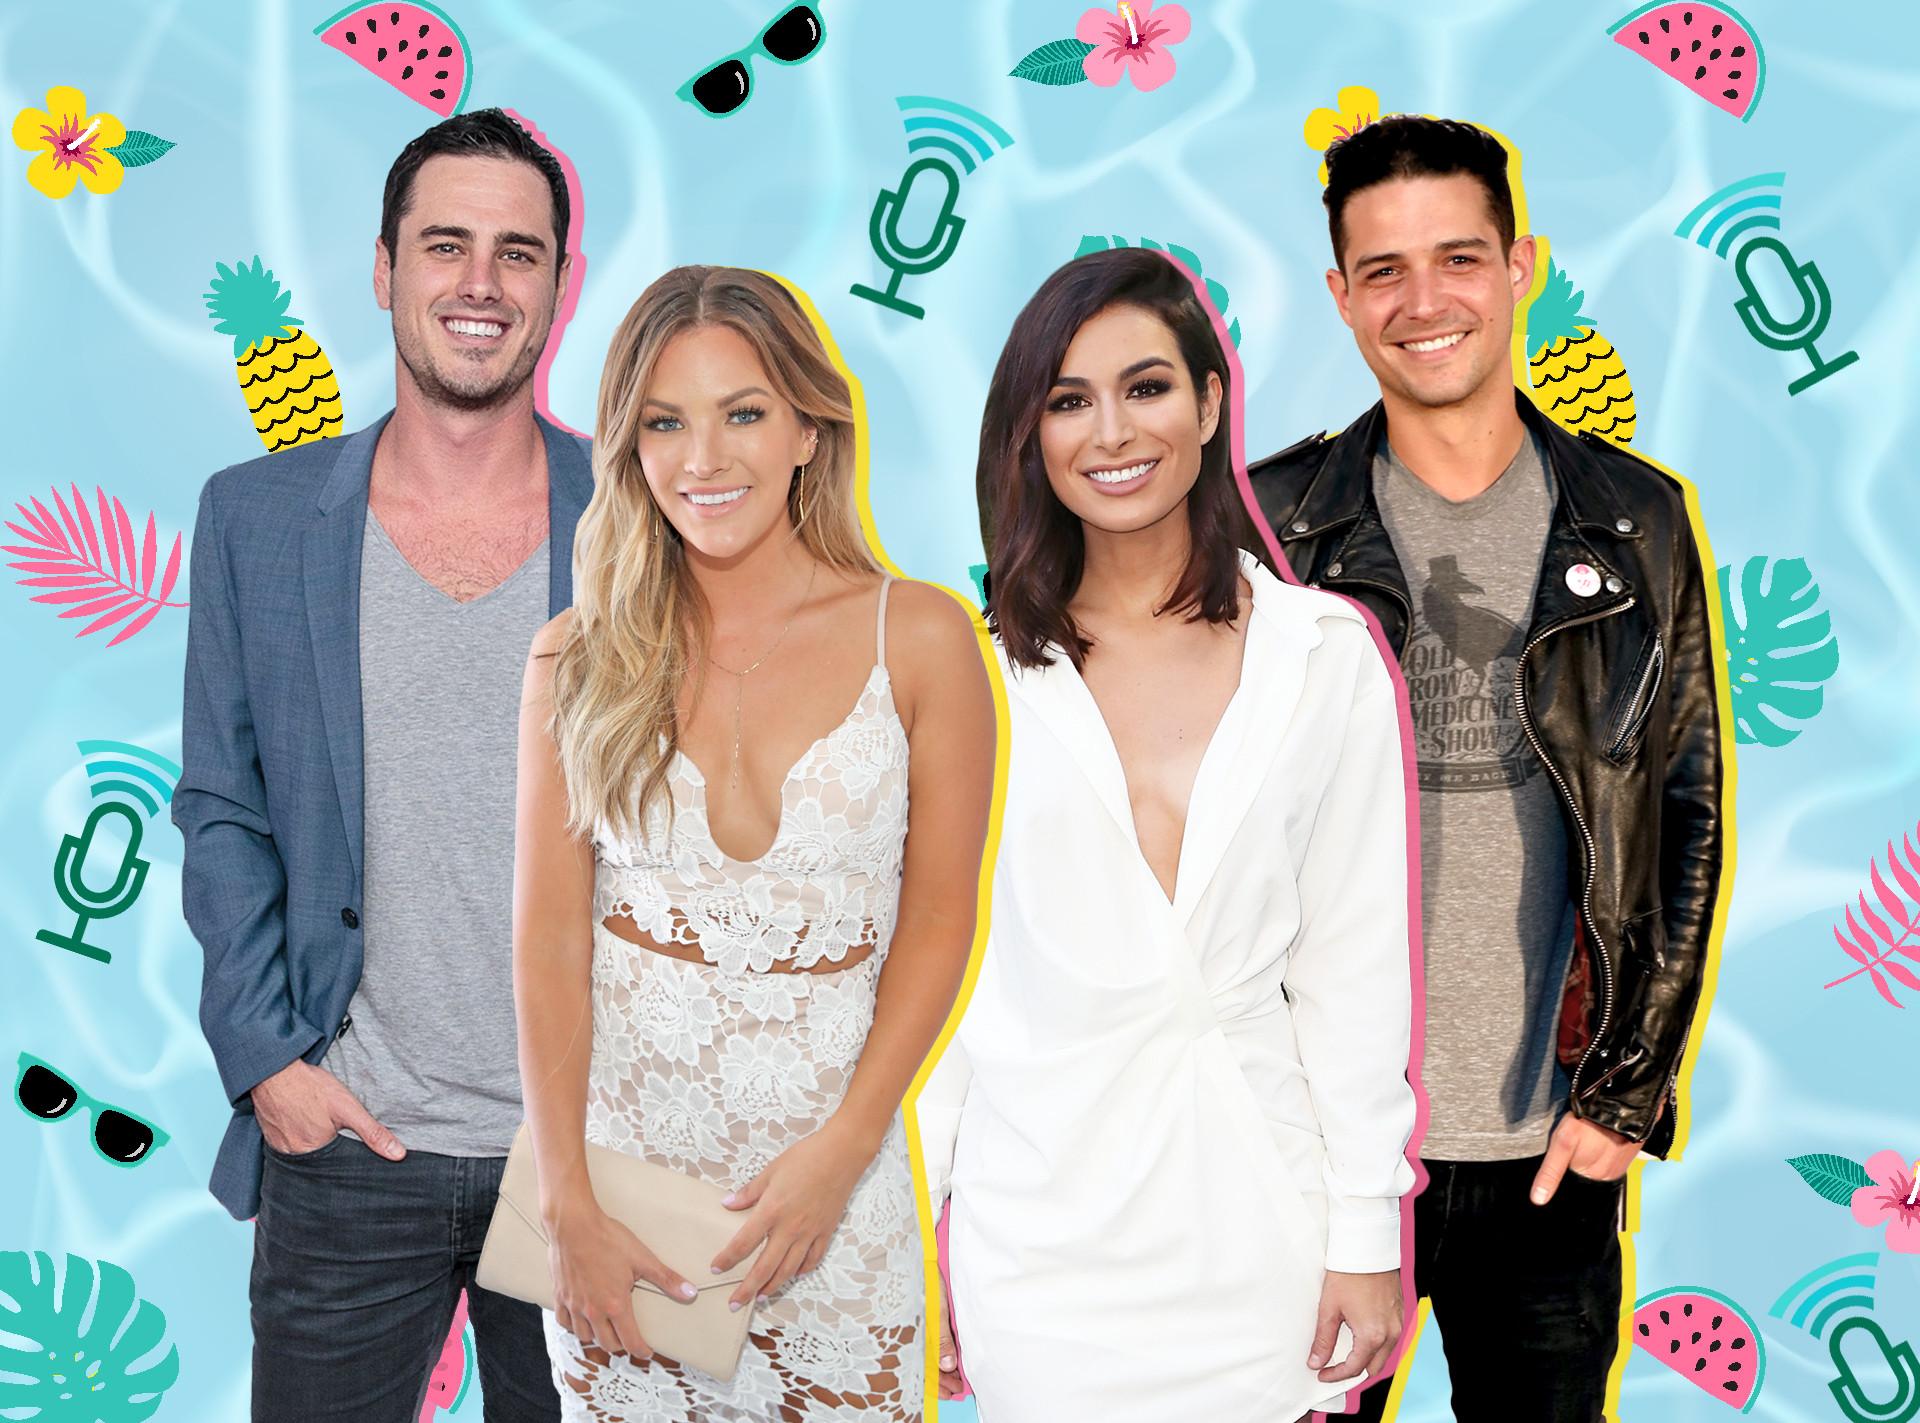 Bachelor Nation Summer Tips, Ben Higgins, Becca Tilley, Ashley Iaconetti, Wells Adams